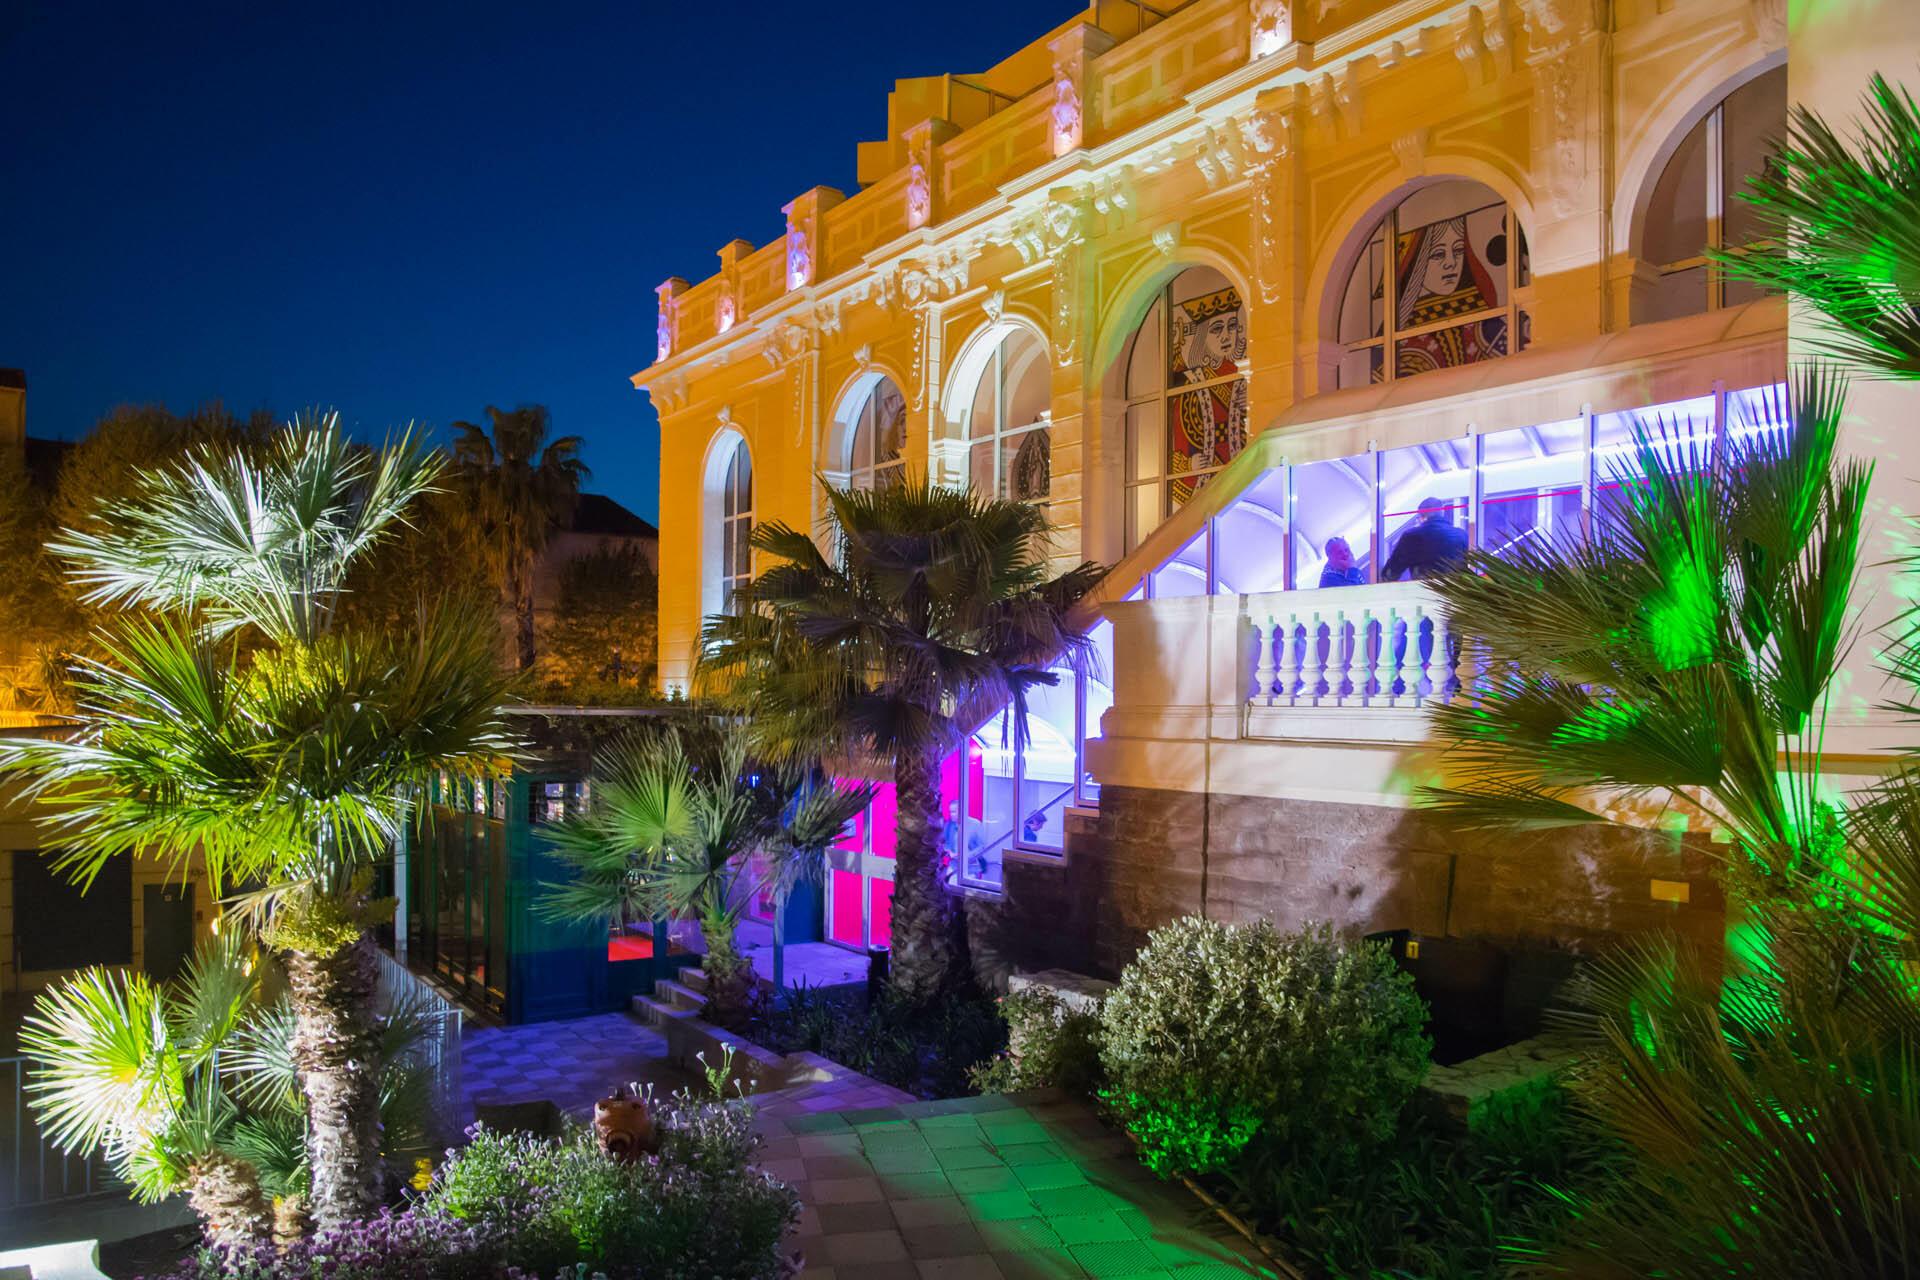 Hotel Casino des Palmiers in Hyères, France